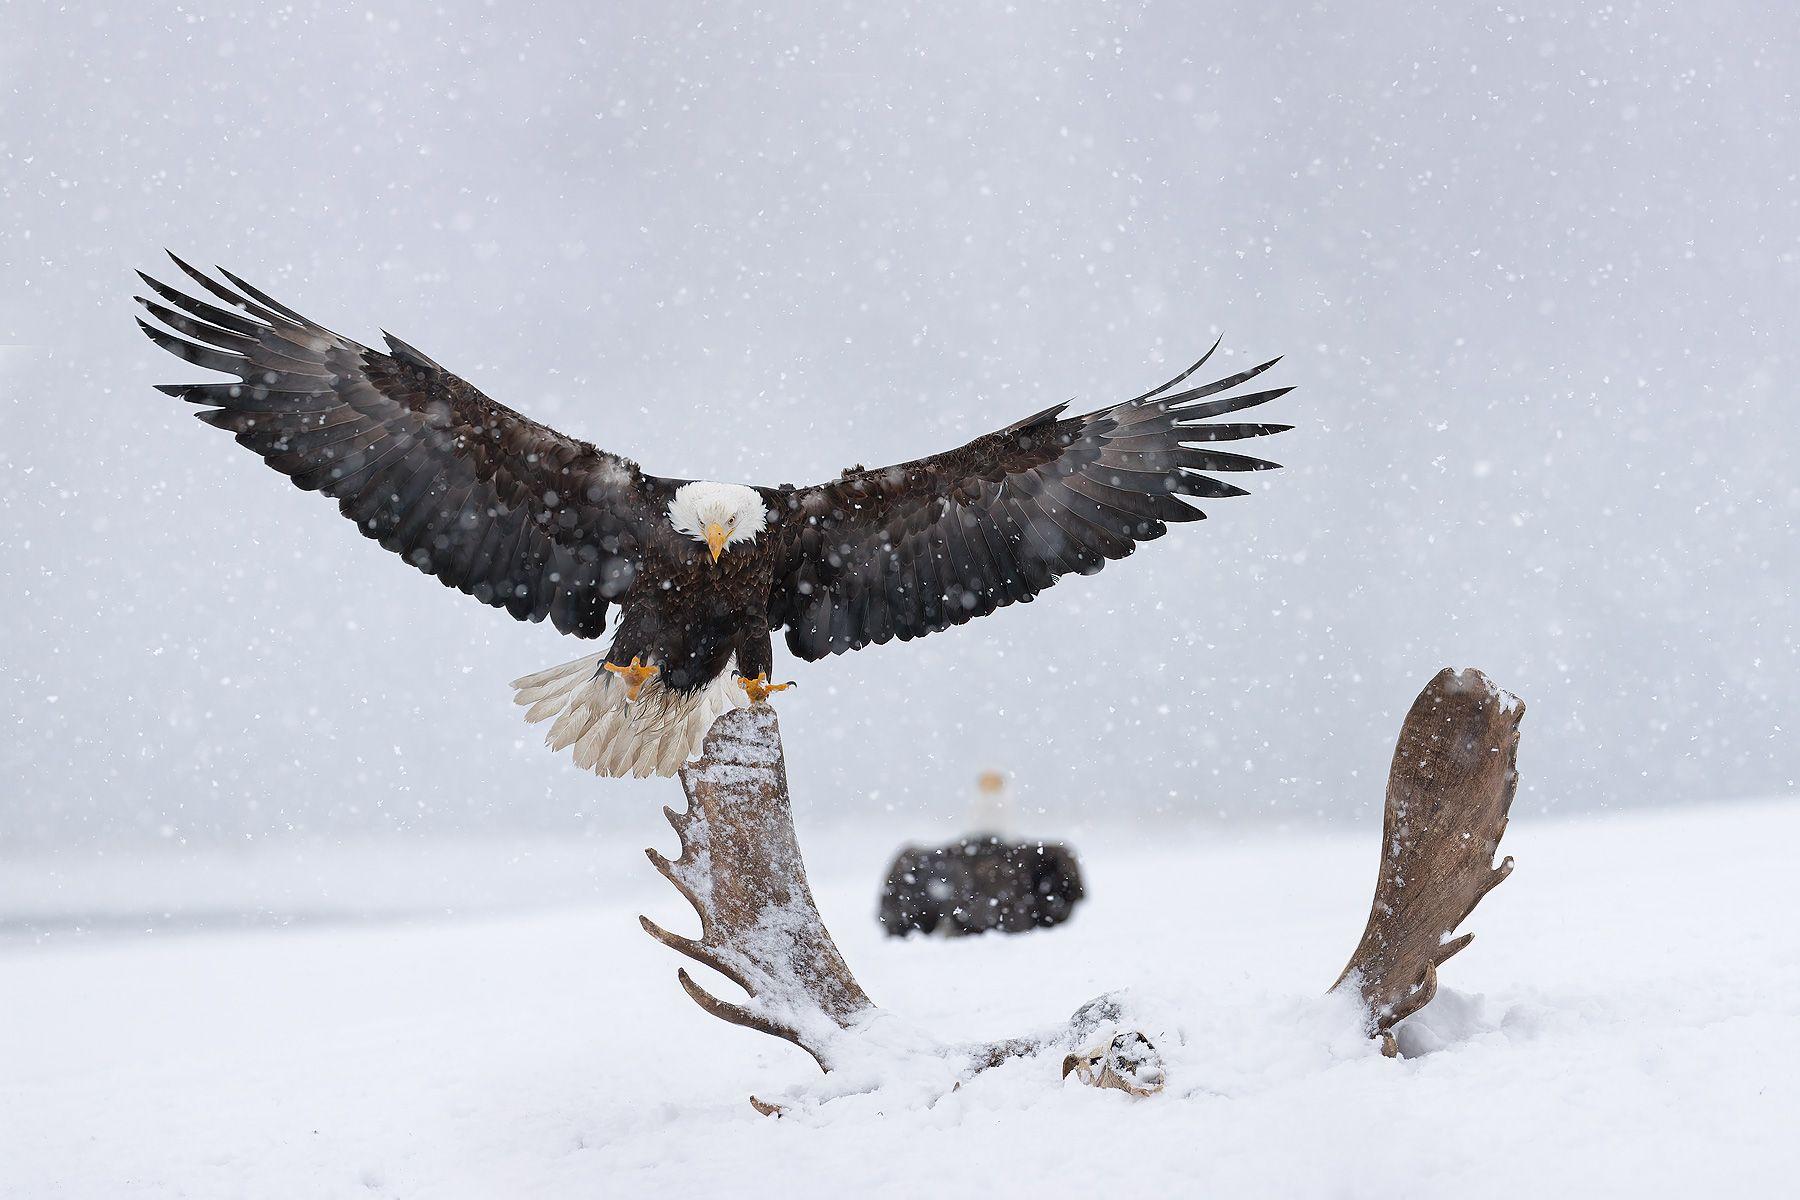 Bald-eagle-landing-on-moose-antler-composite-II_74I3390-Kachemak-Bay,-Alaska,-USA.jpg